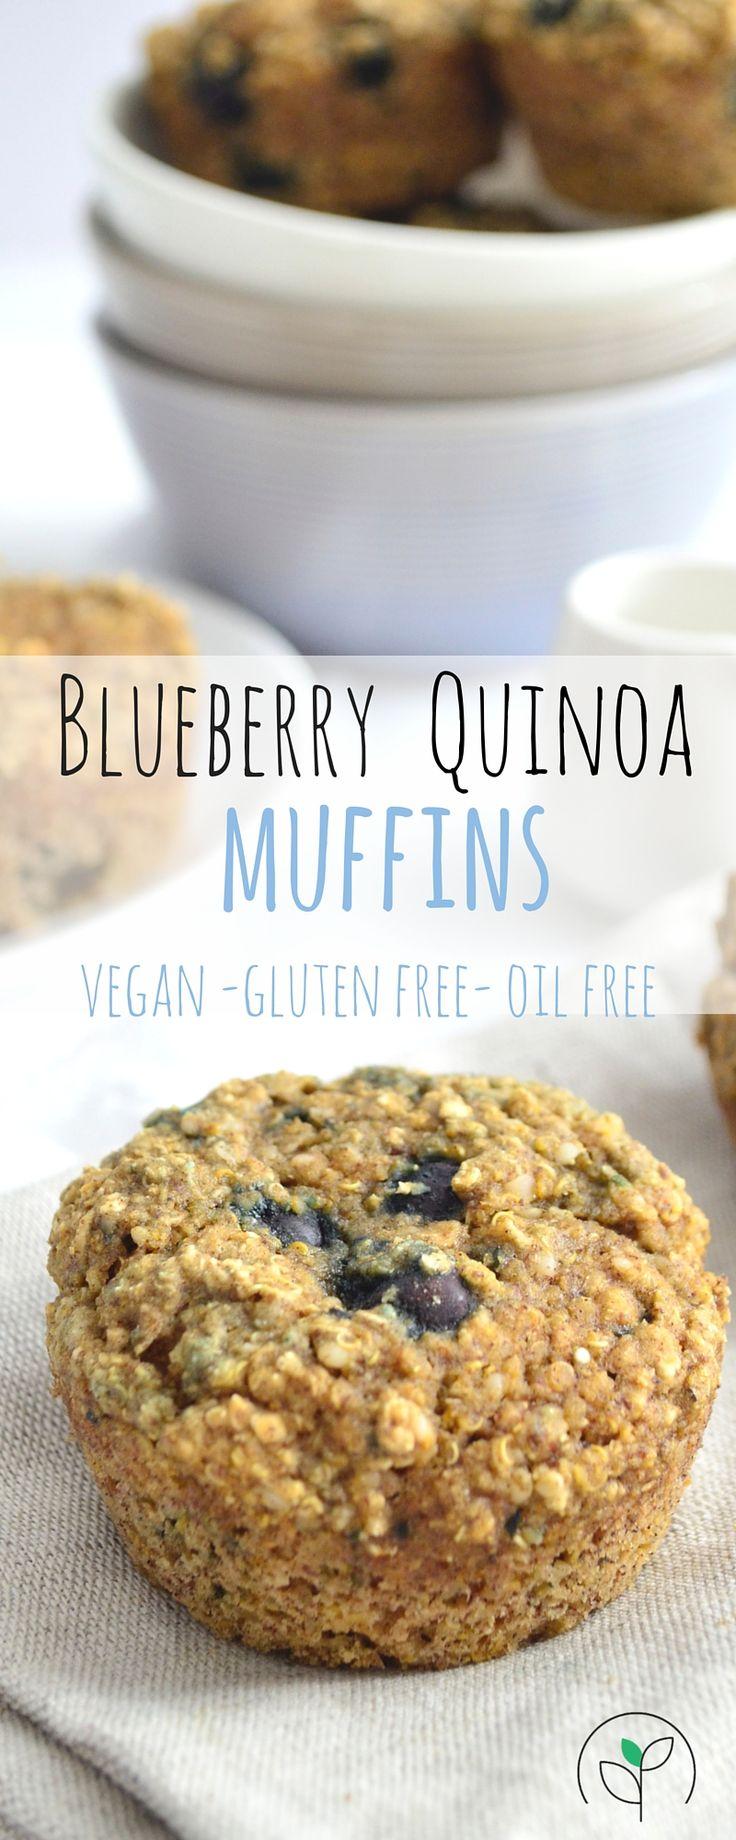 Blueberry Quinoa Muffin, high protein, gluten free, omega 3 rich #glutenfree #vegan #quinoa #highprotein #omega3